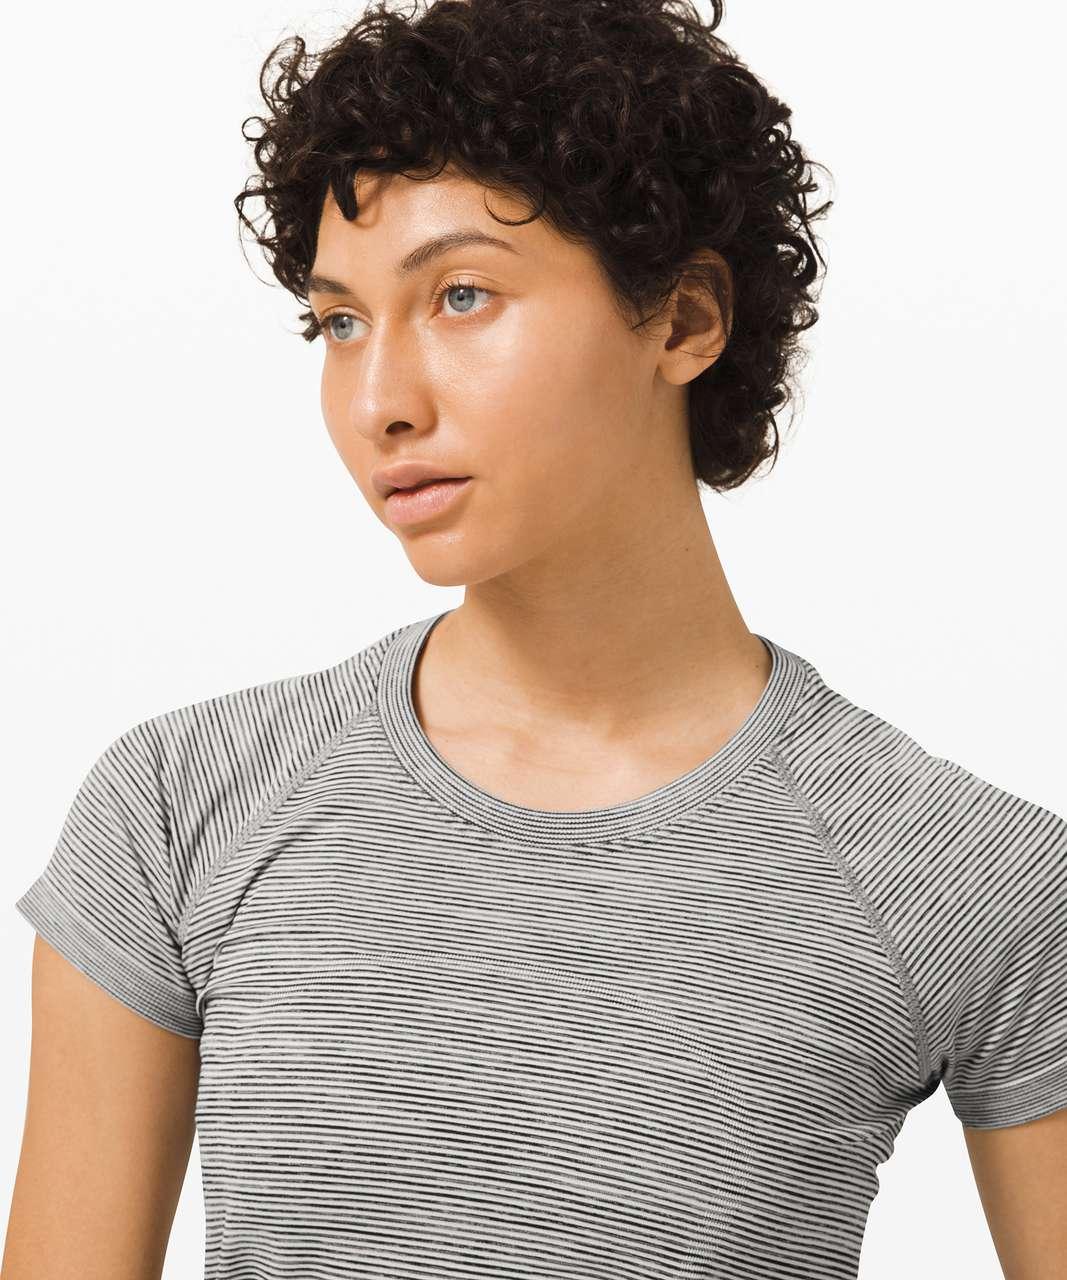 Lululemon Swiftly Tech Short Sleeve 2.0 - White / White / Black